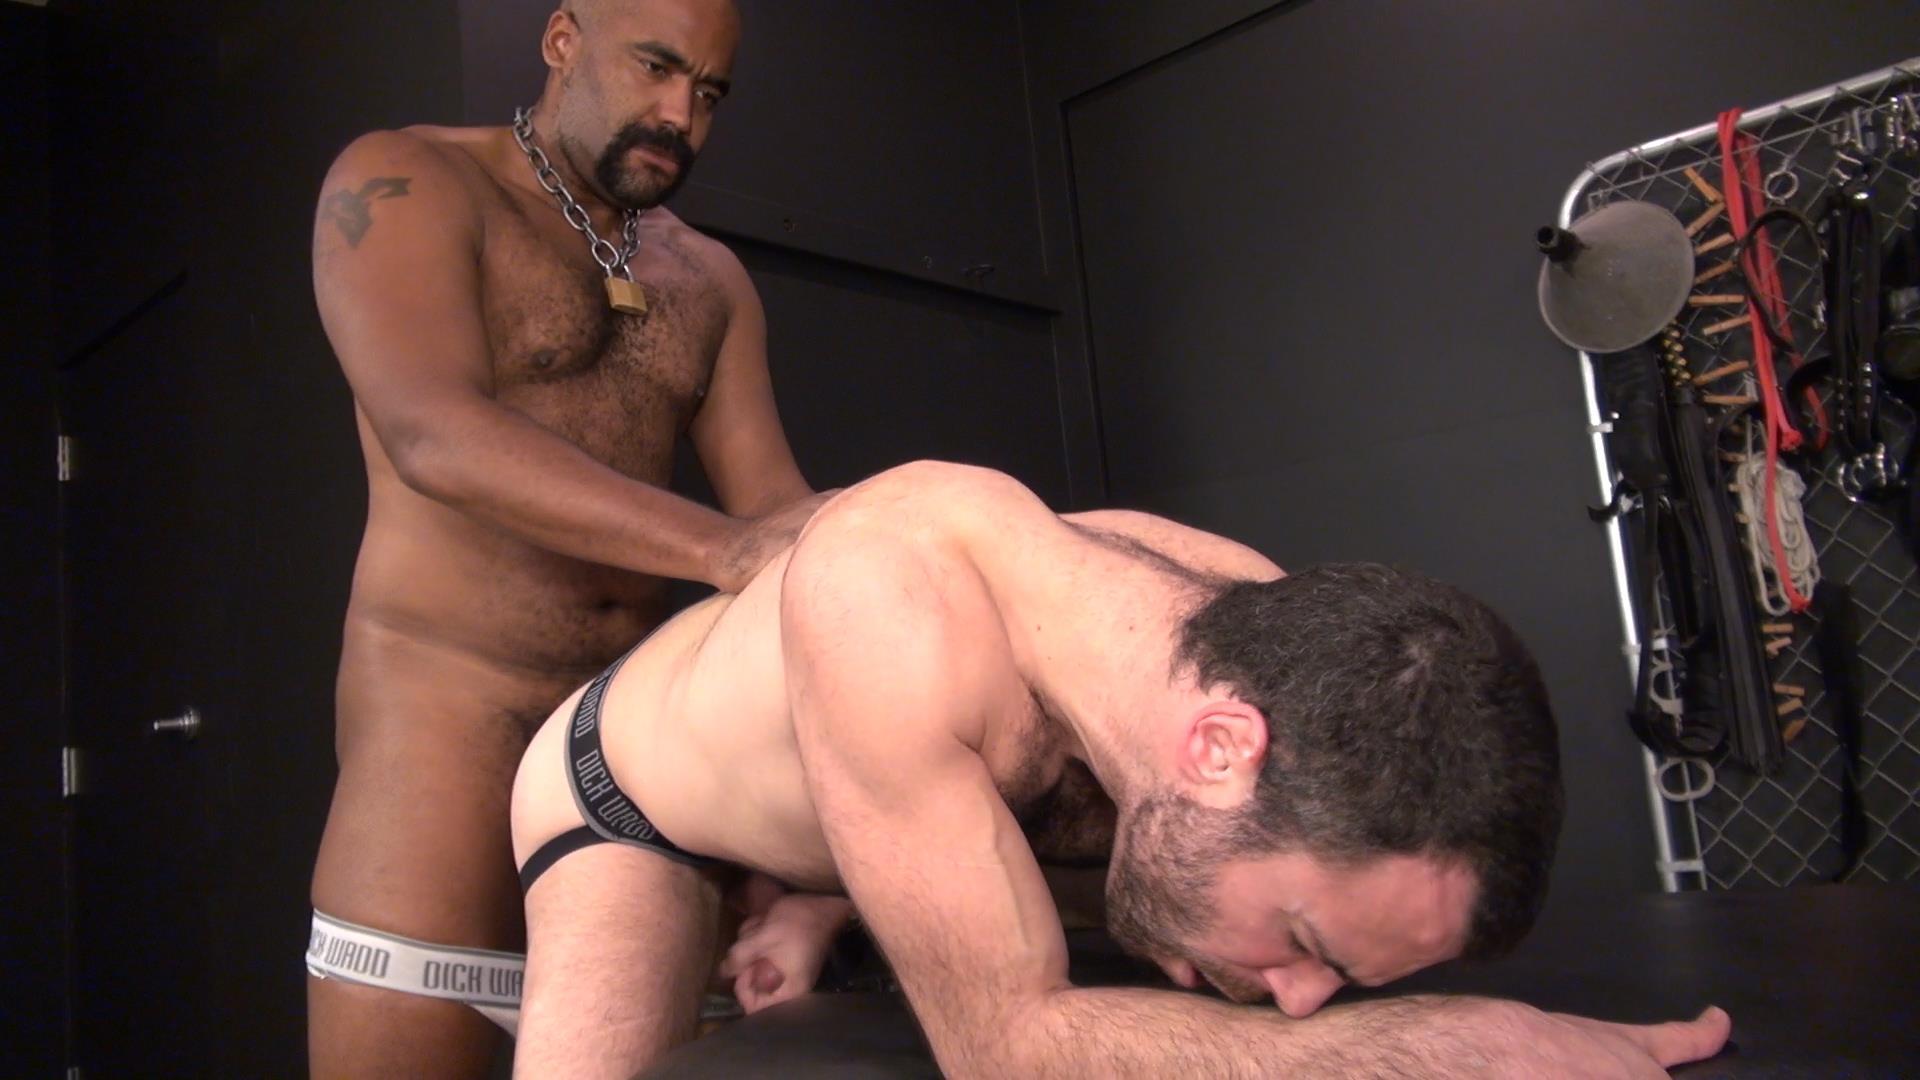 Raw and rough bareback videos gay porn videos gay-25